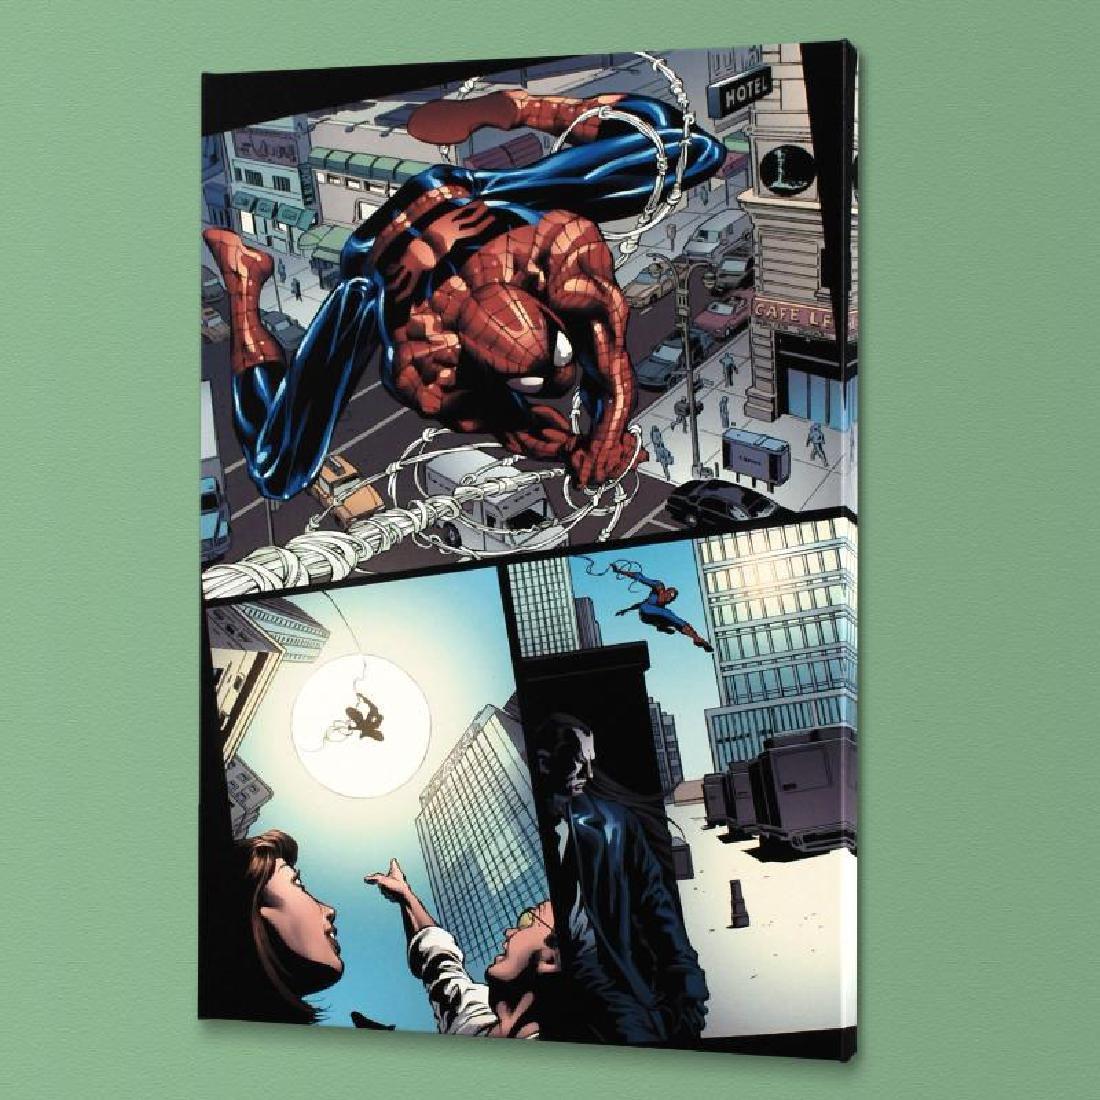 Amazing Spider-Man #526 by Marvel Comics